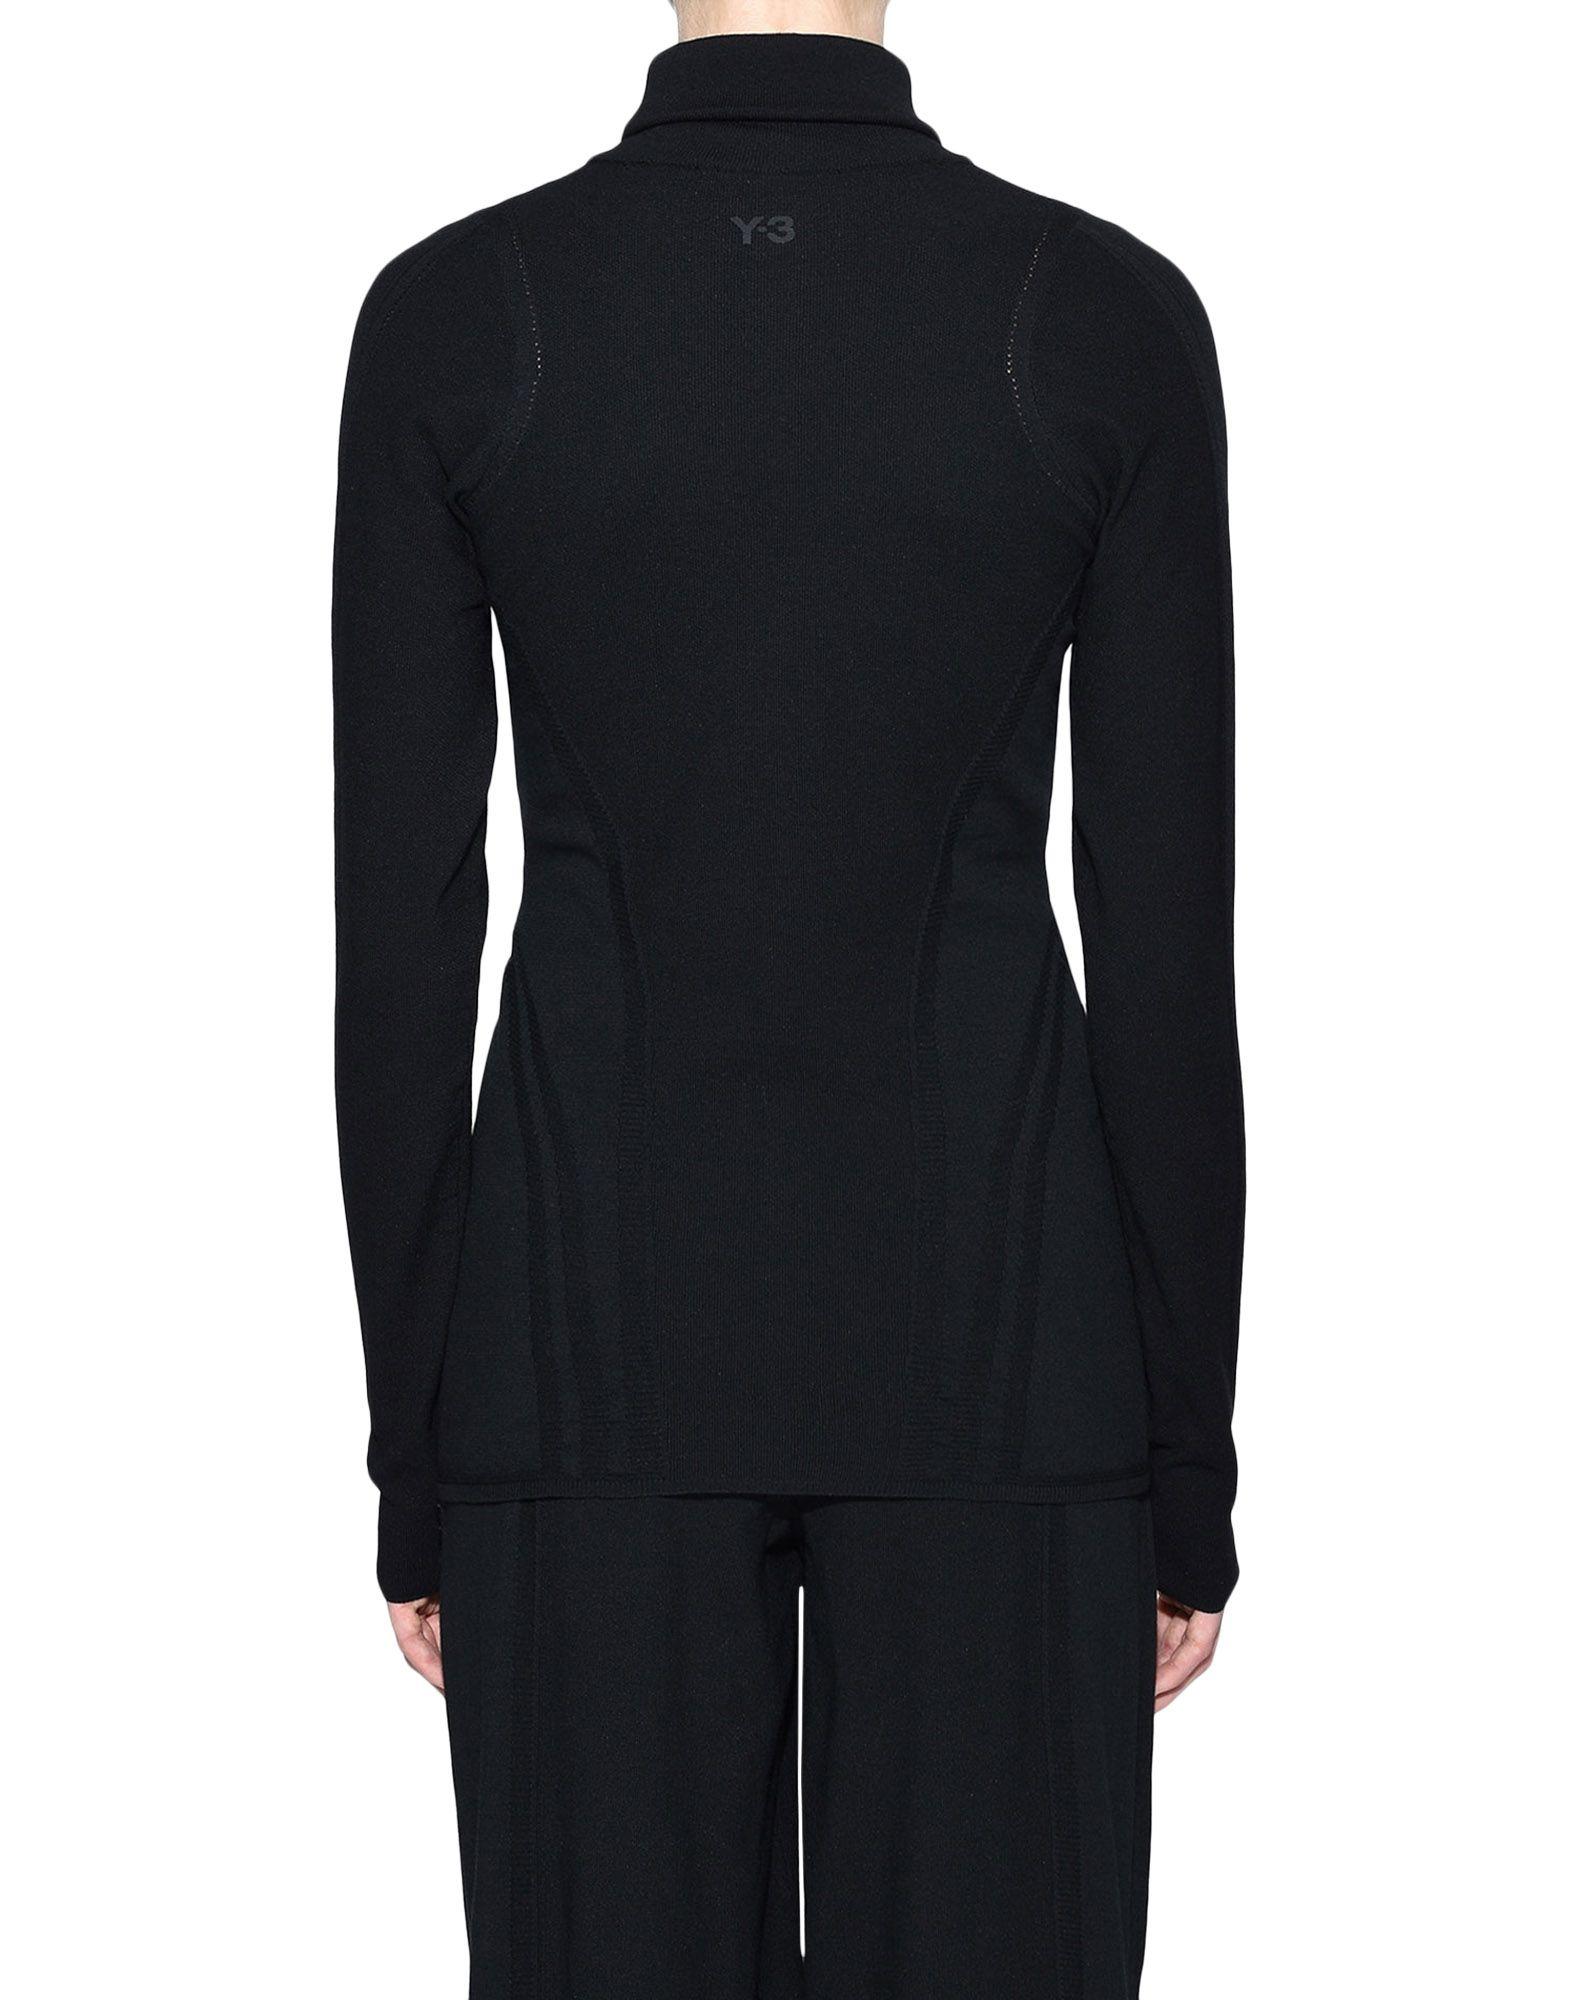 Y-3 Y-3 Tech Wool High Neck Tee Long sleeve t-shirt Woman d